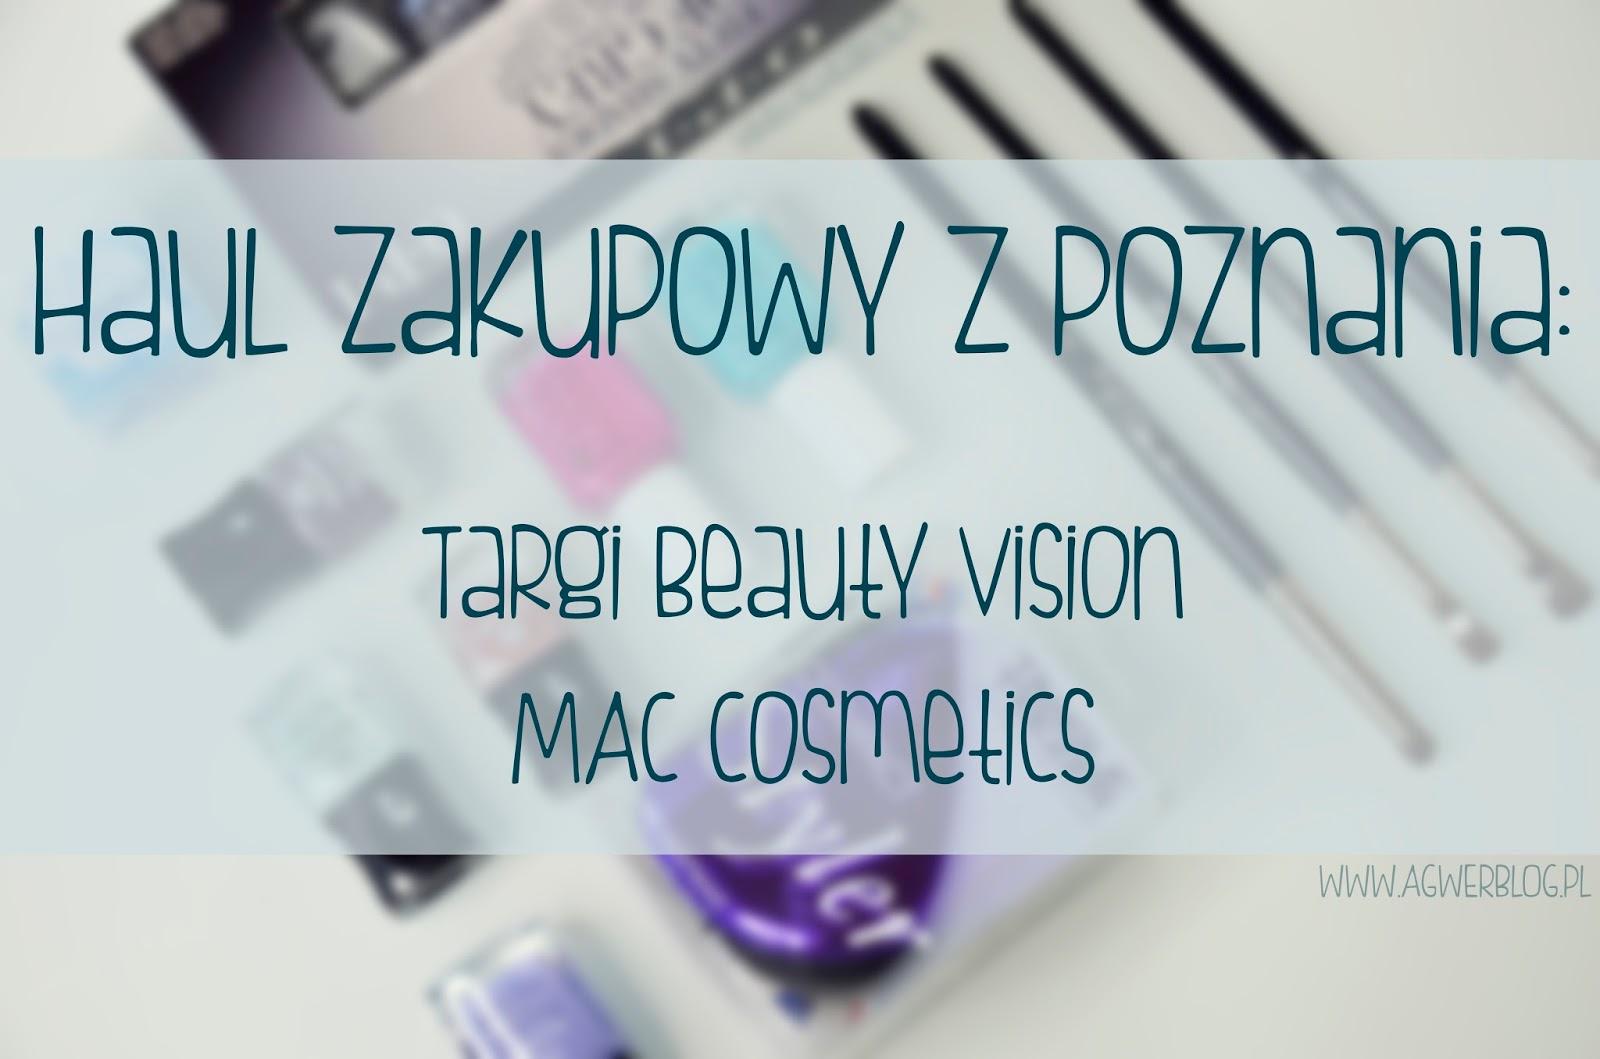 Haul zakupowy Poznań: MAC cosmetic, targi Beauty Vision